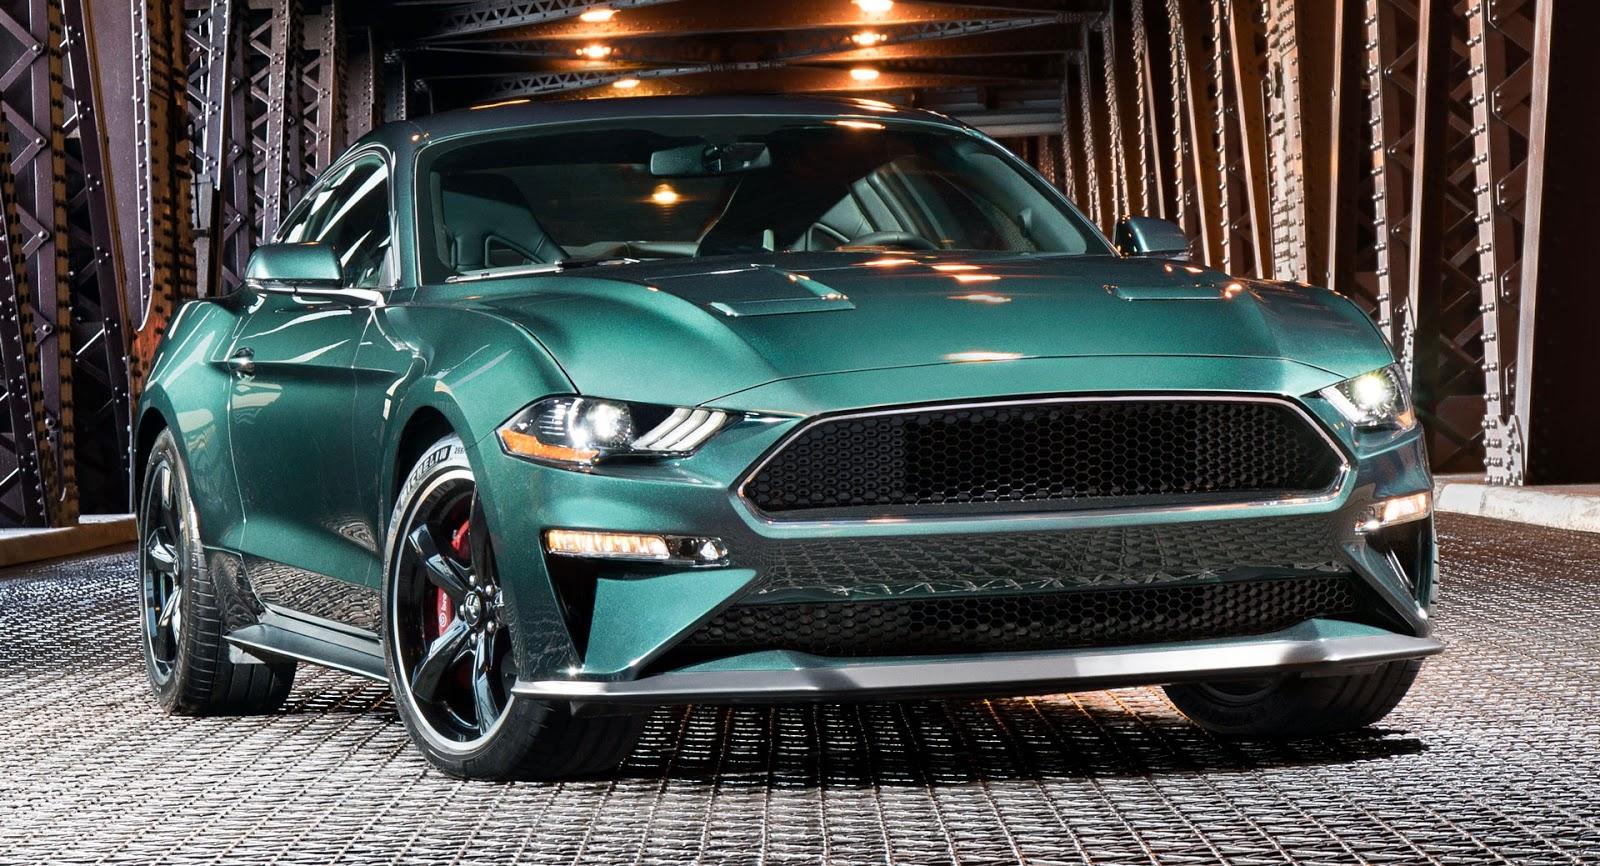 2019 Ford Mustang Bullitt Unveiled! | Petrol Portal